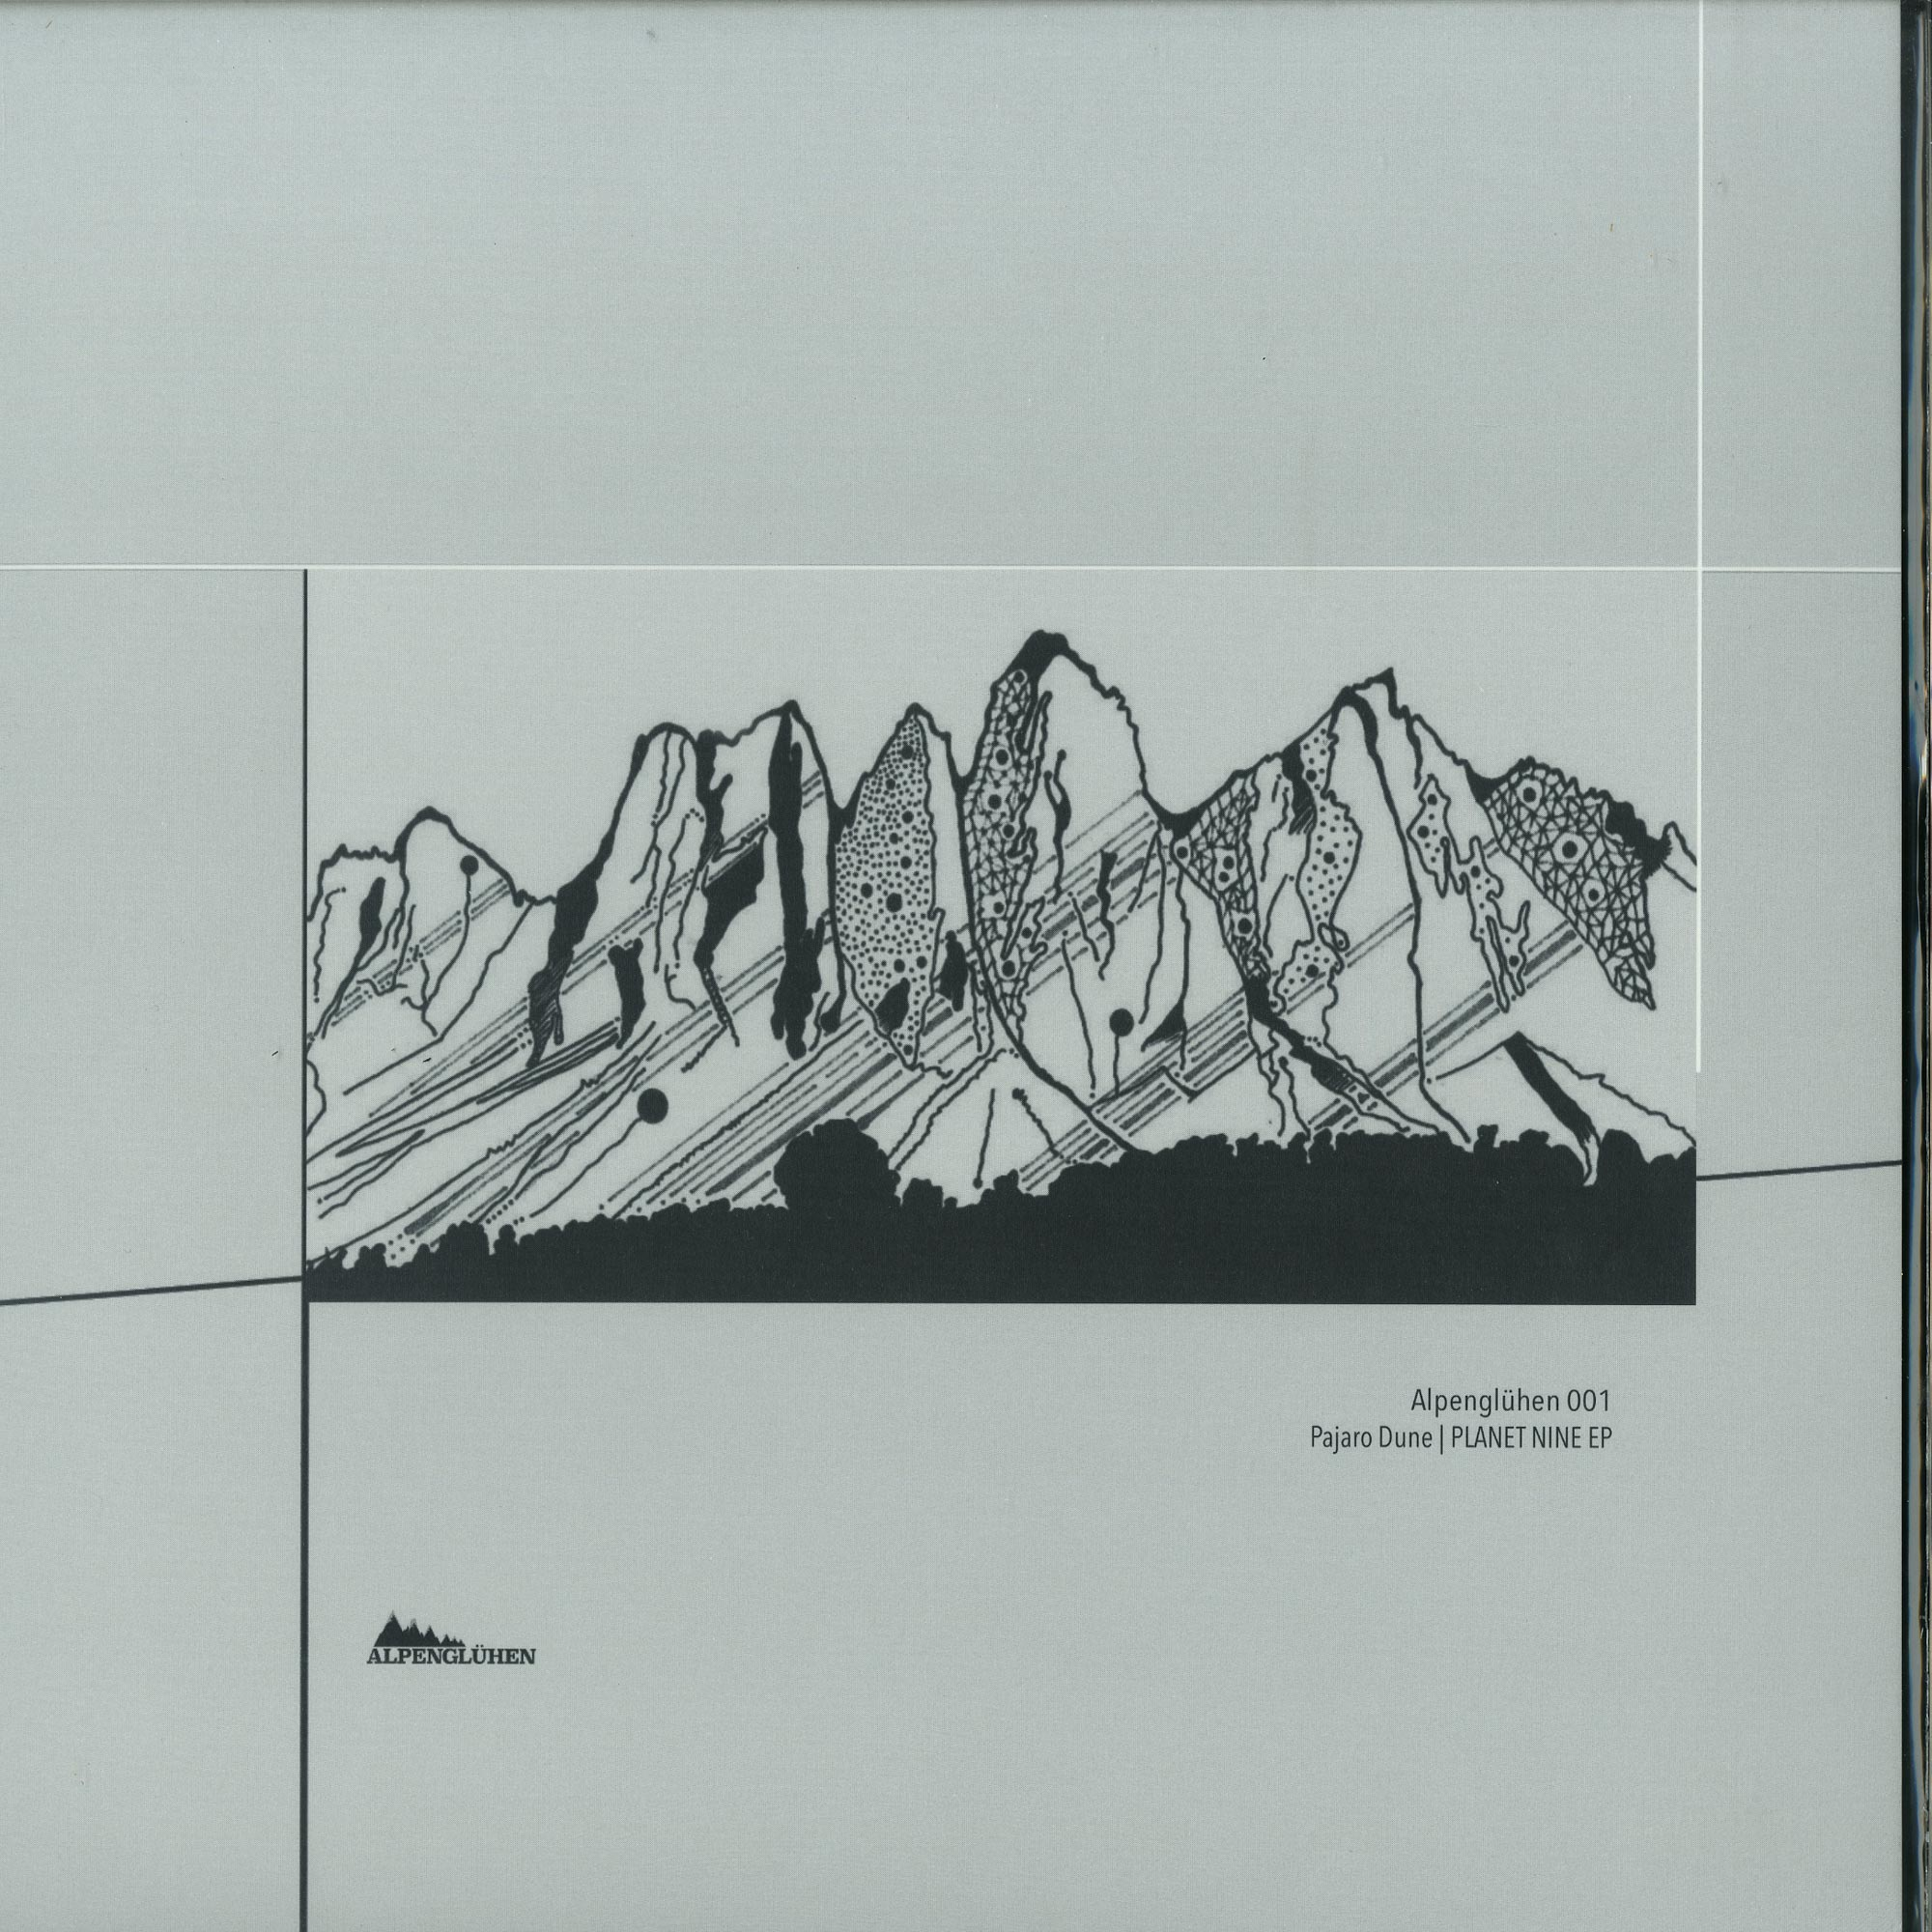 Pajaro Dune - PLANET NINE EP